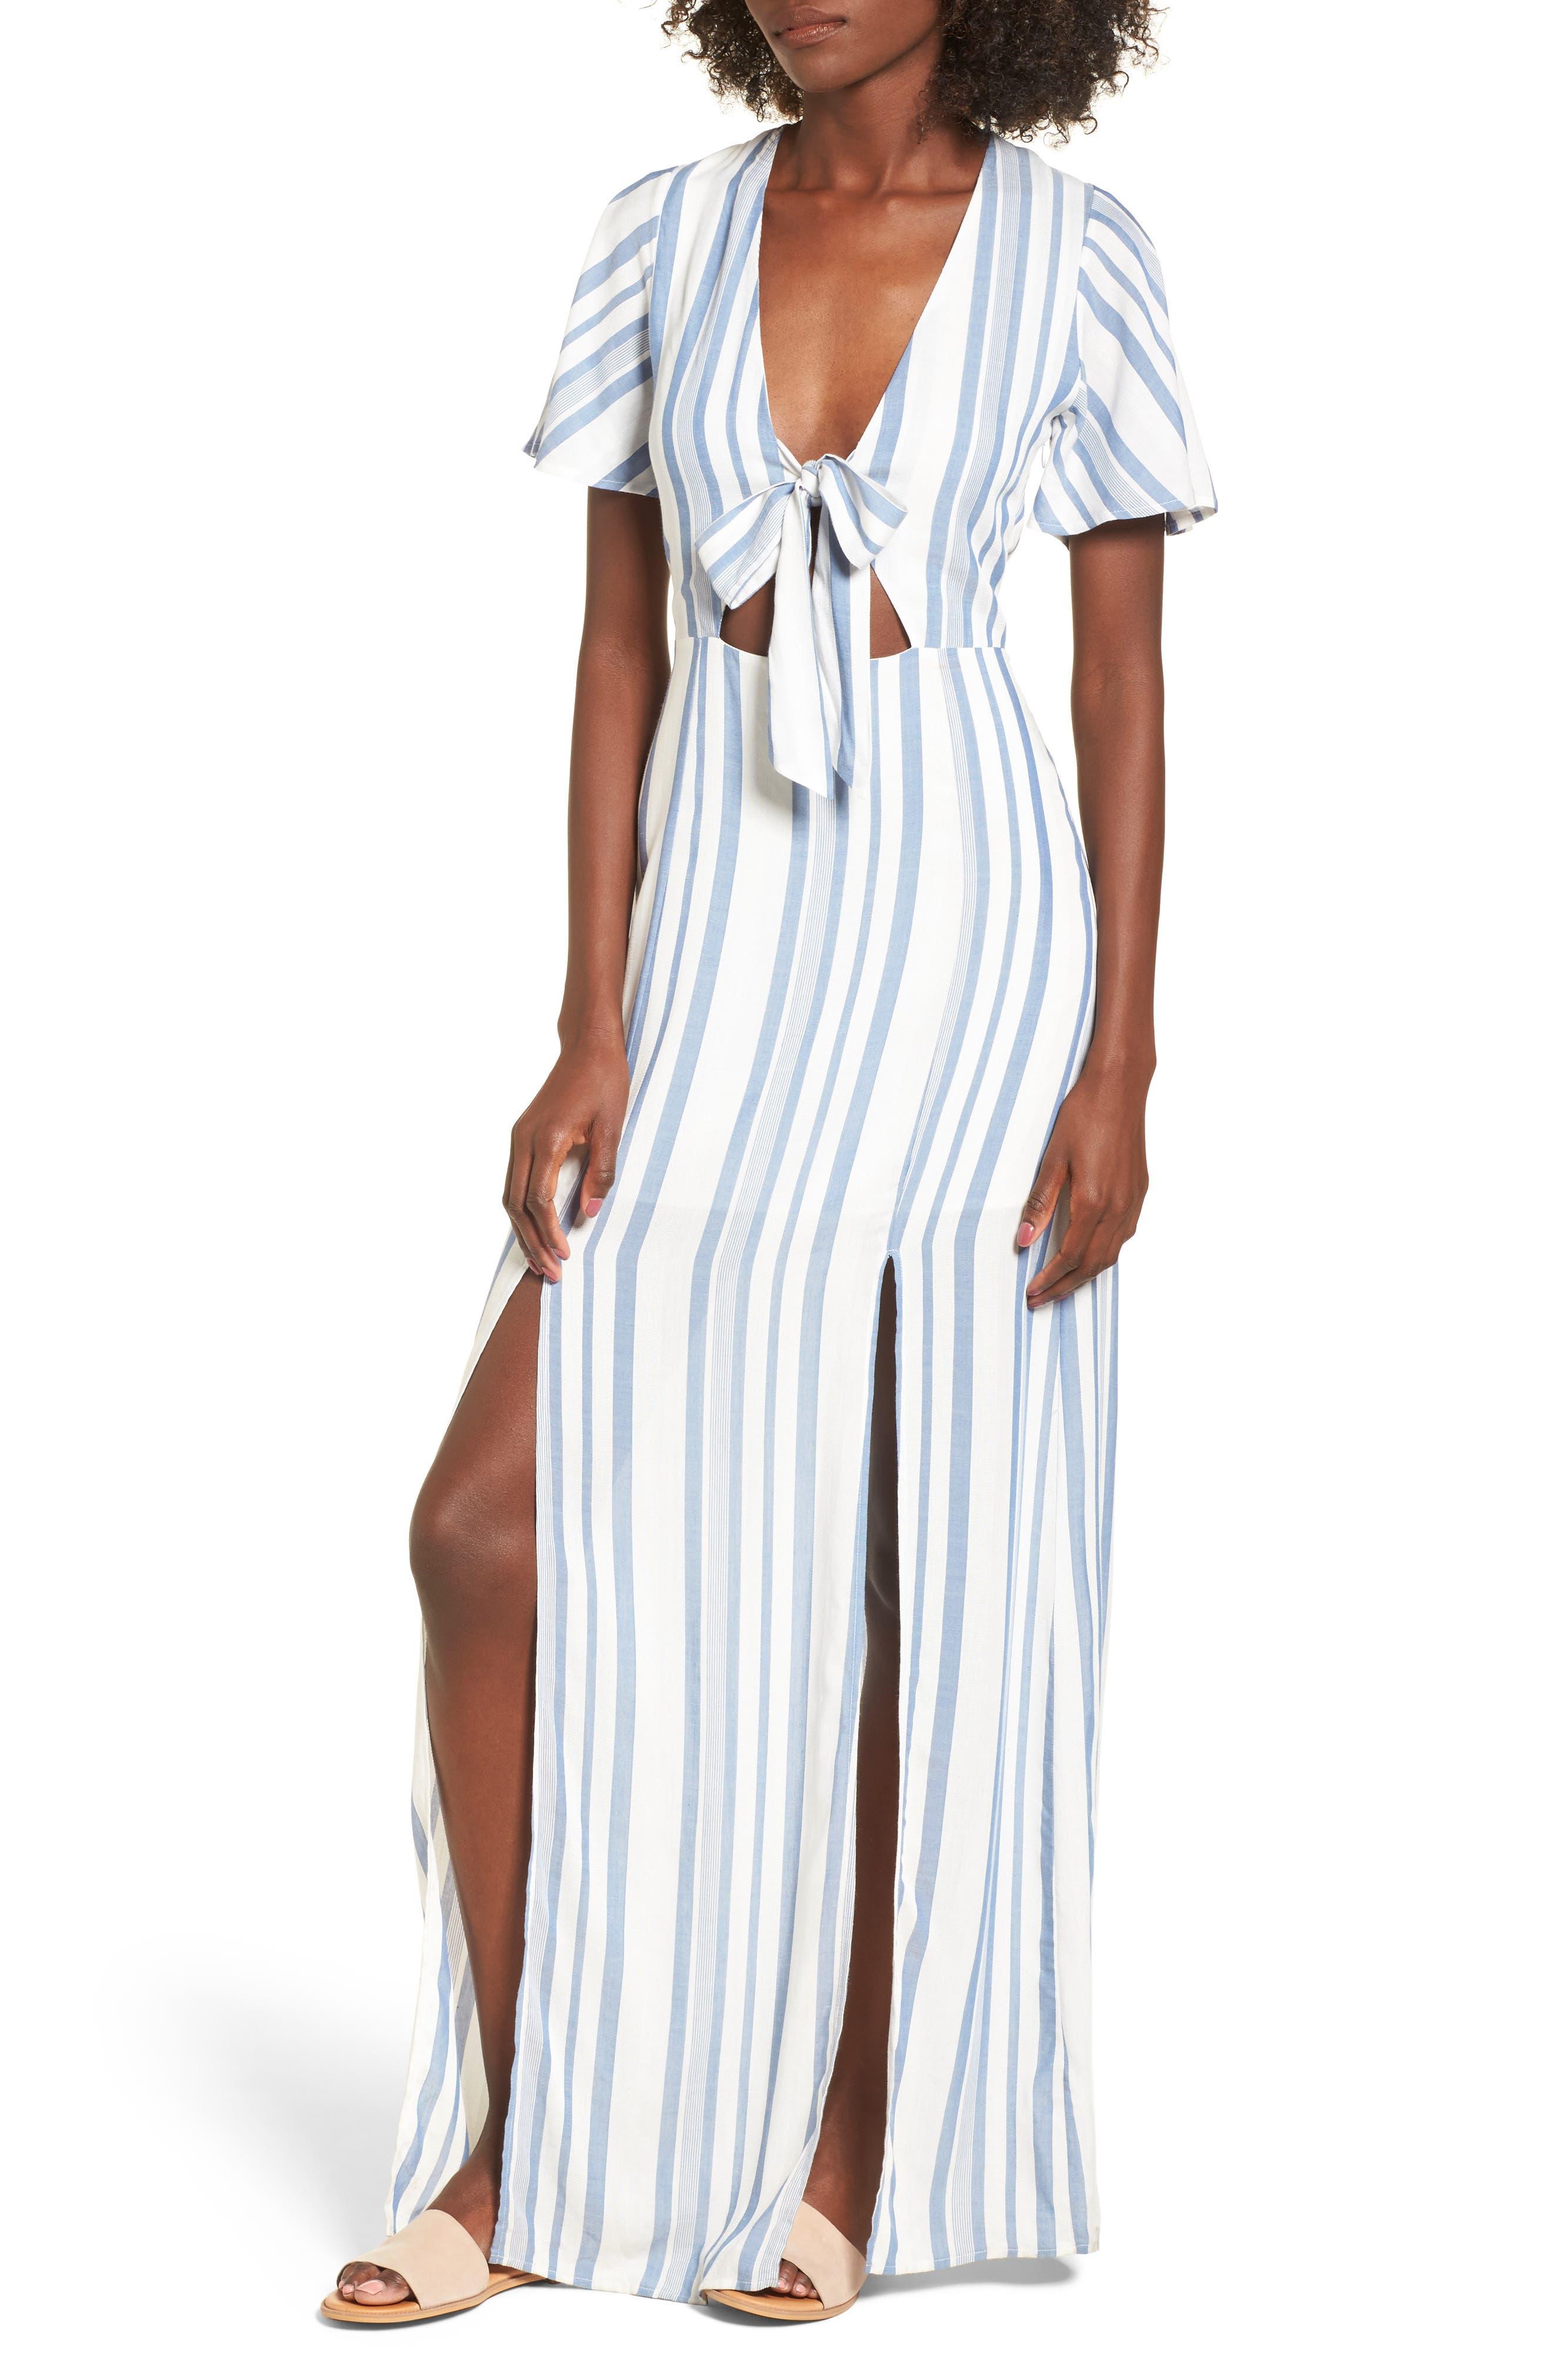 Bow Front Marina Maxi Dress,                         Main,                         color, White/ Blue